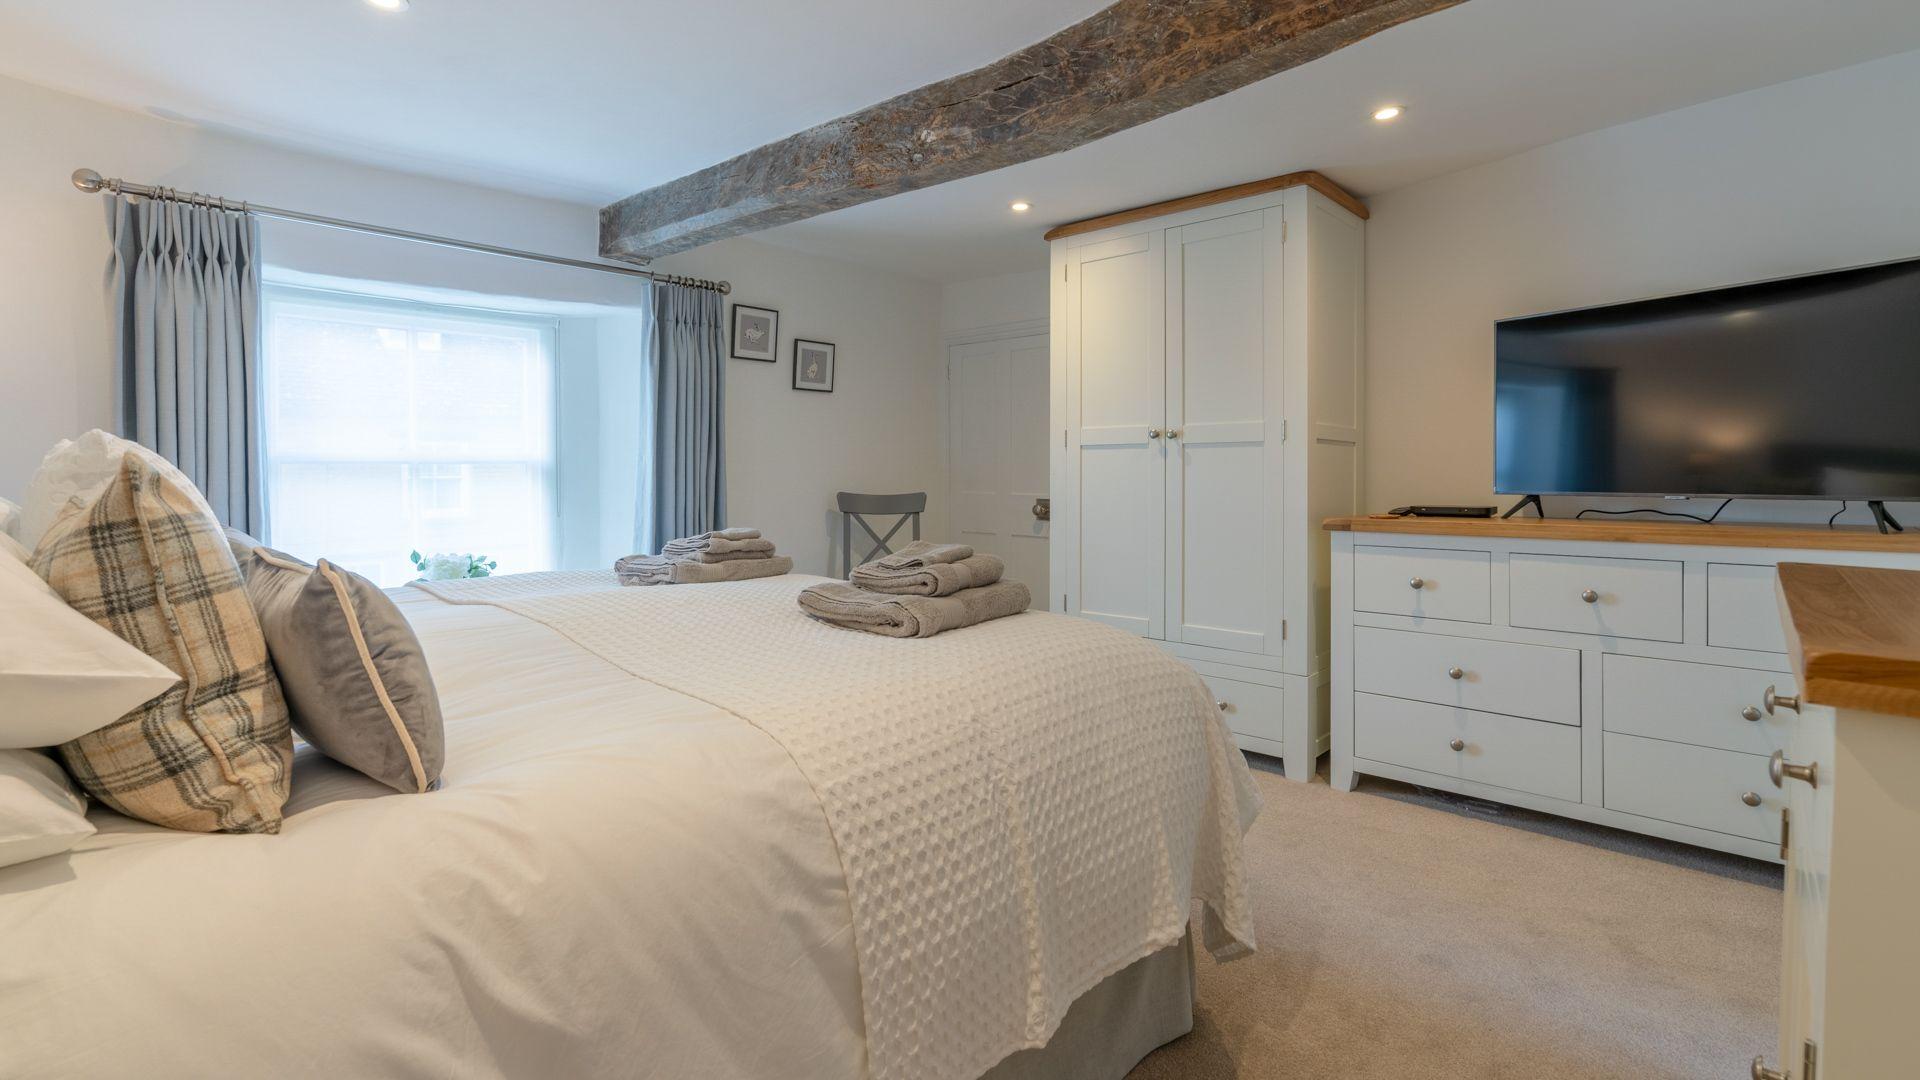 Bedroom 1, Tachbrook, Bolthole Retreats